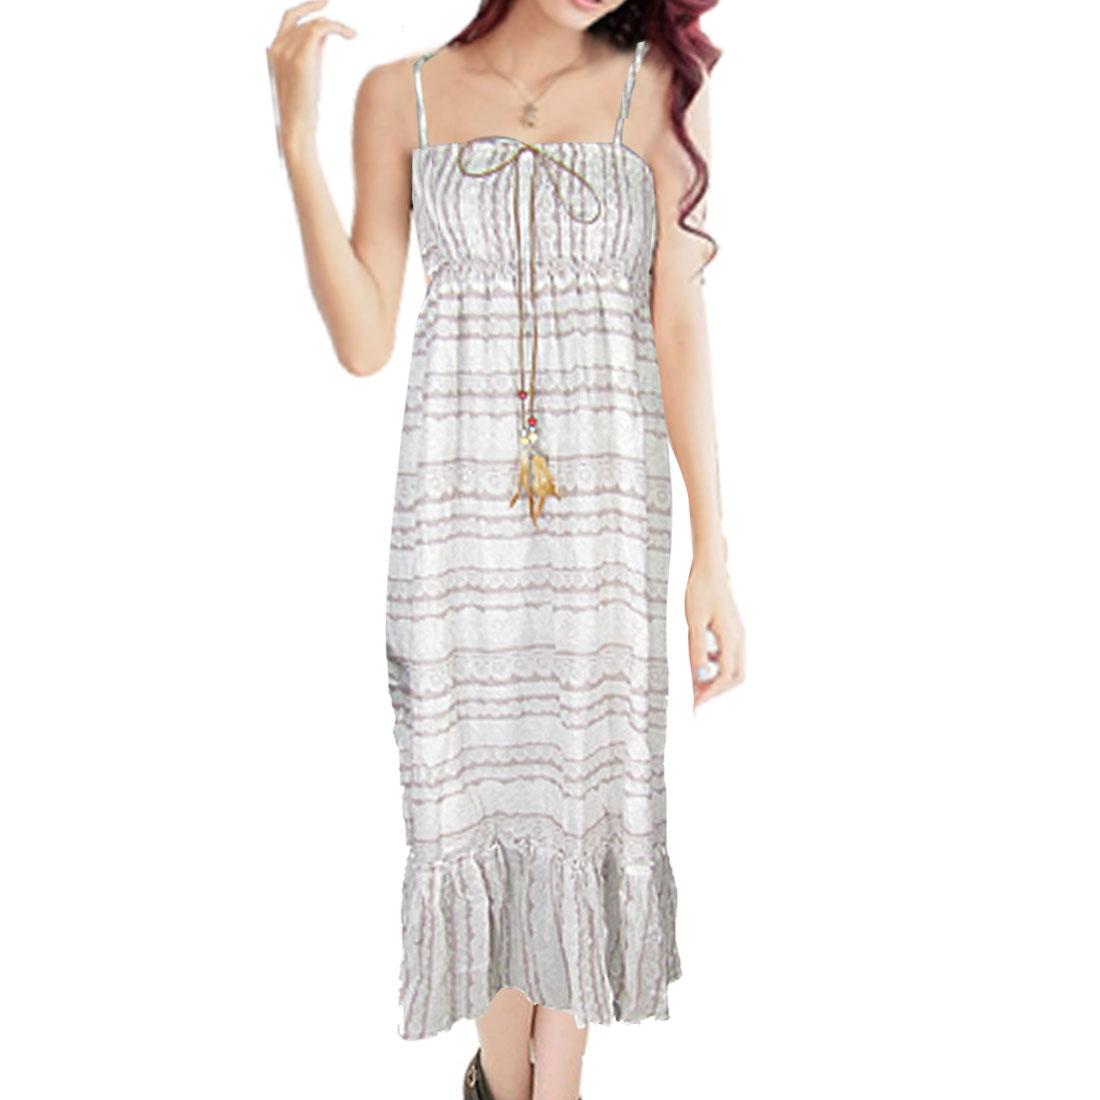 Bohemia Style Elastic Bust Floral Self Tie Spaghetti Maxi Dress XS